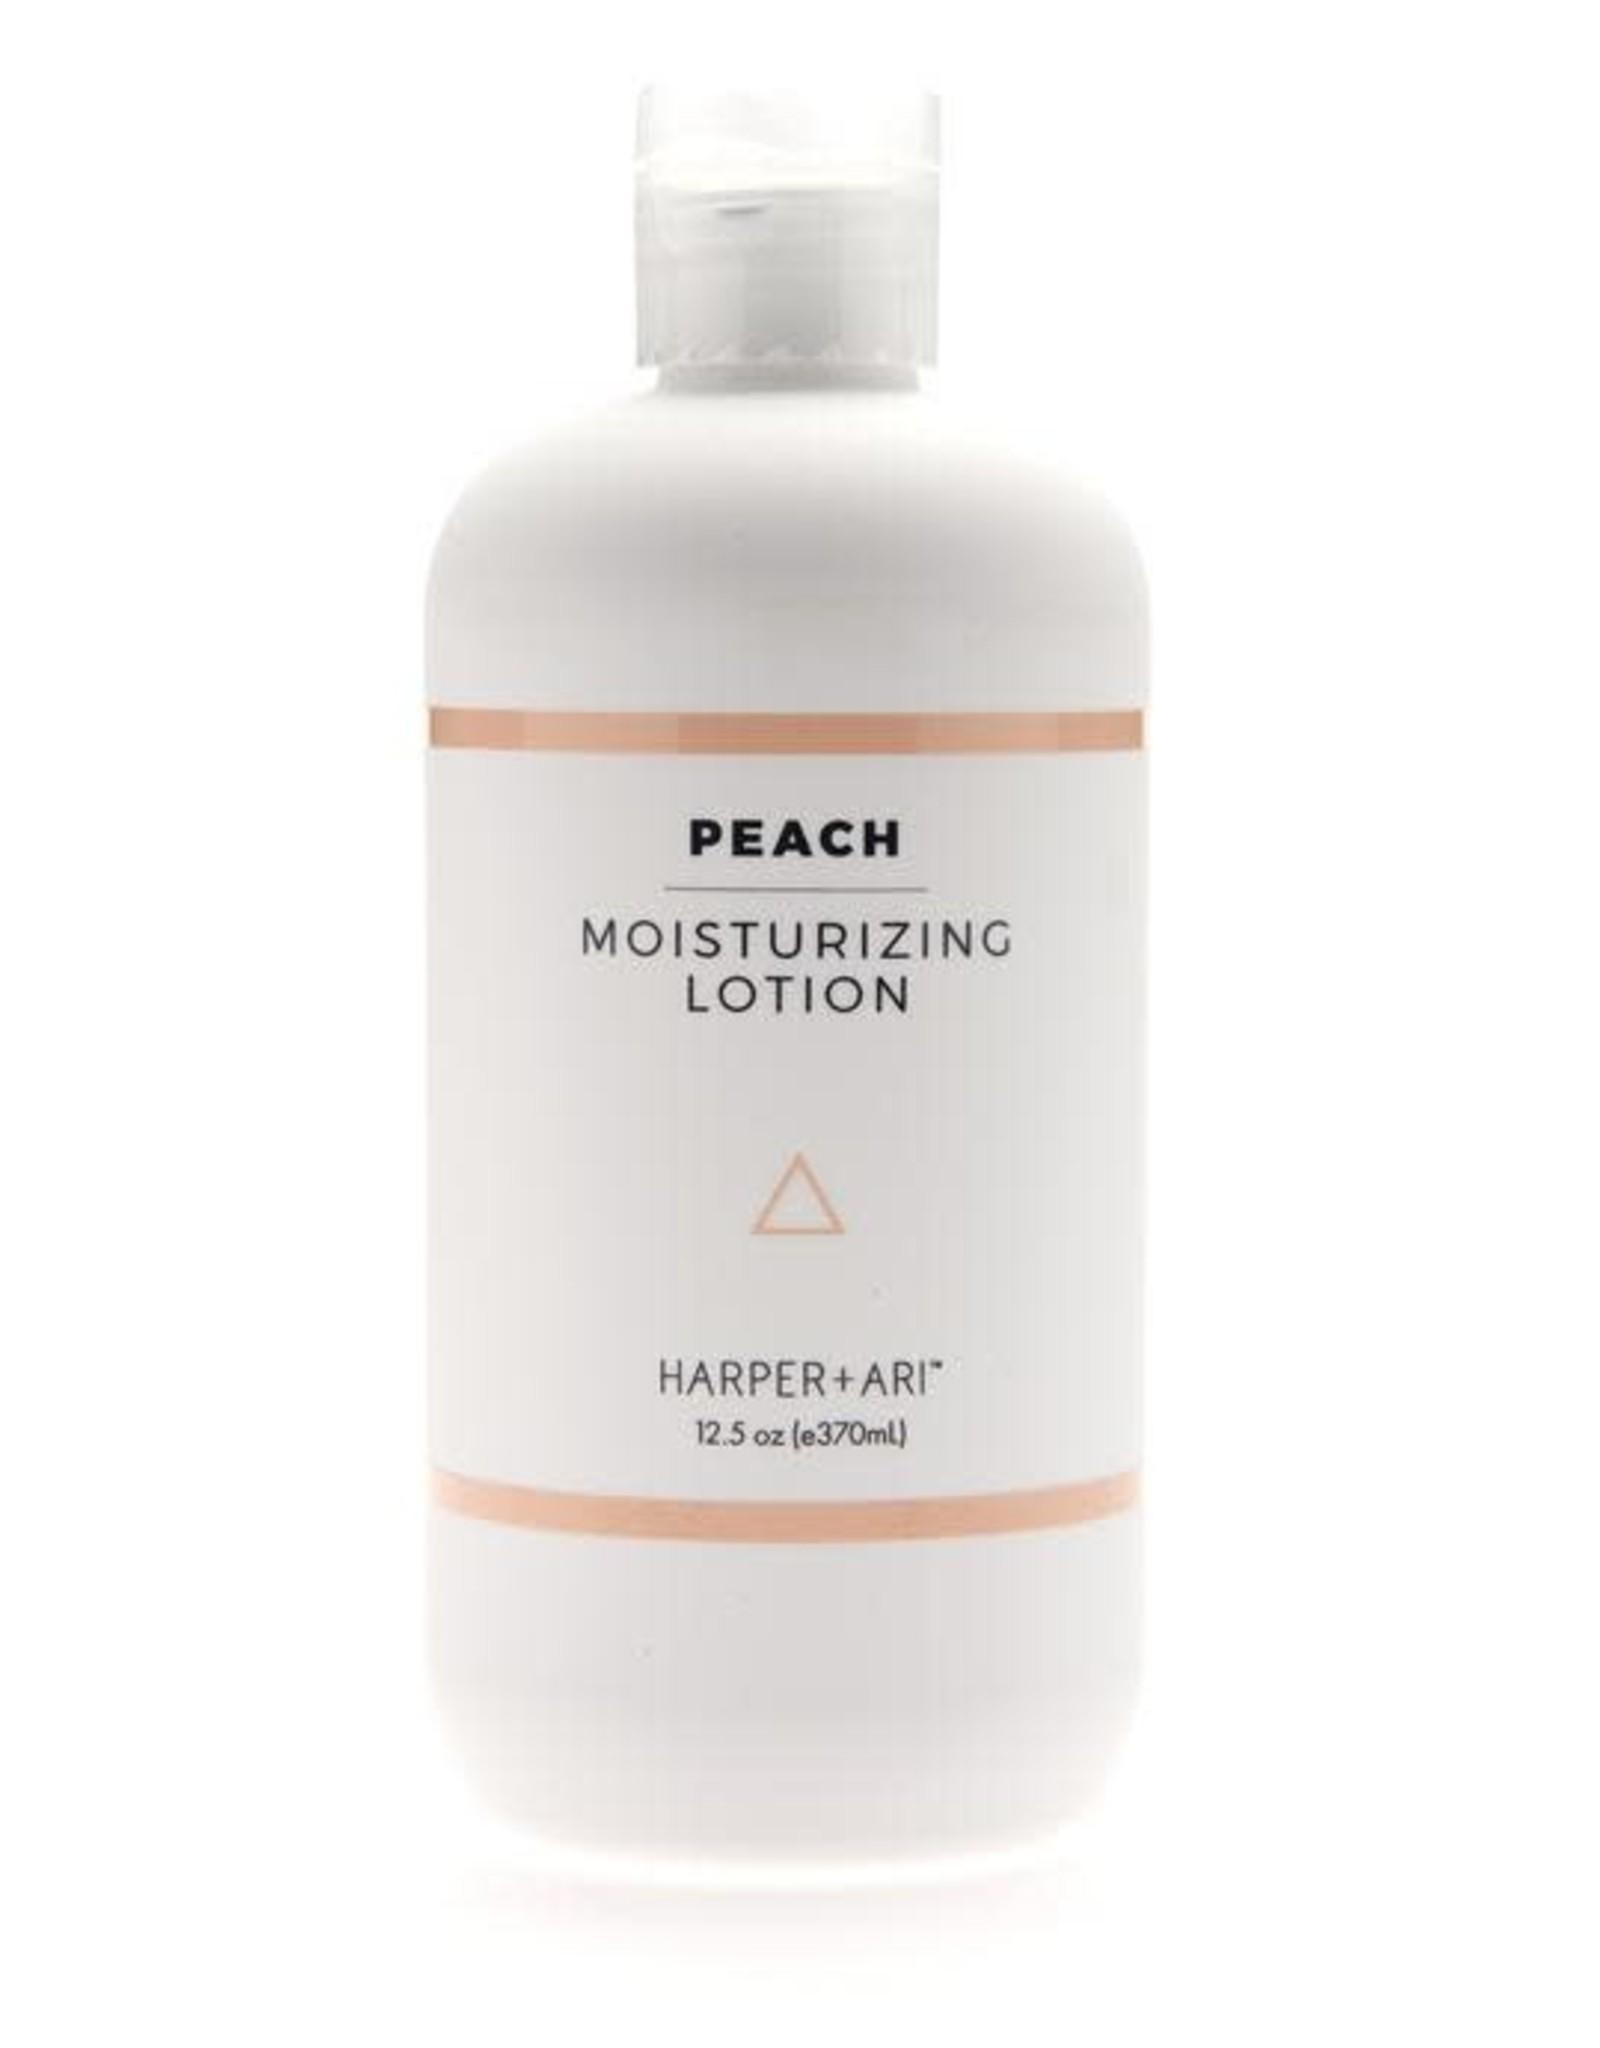 Moisturizing Lotion 12.5oz Bottle Peach